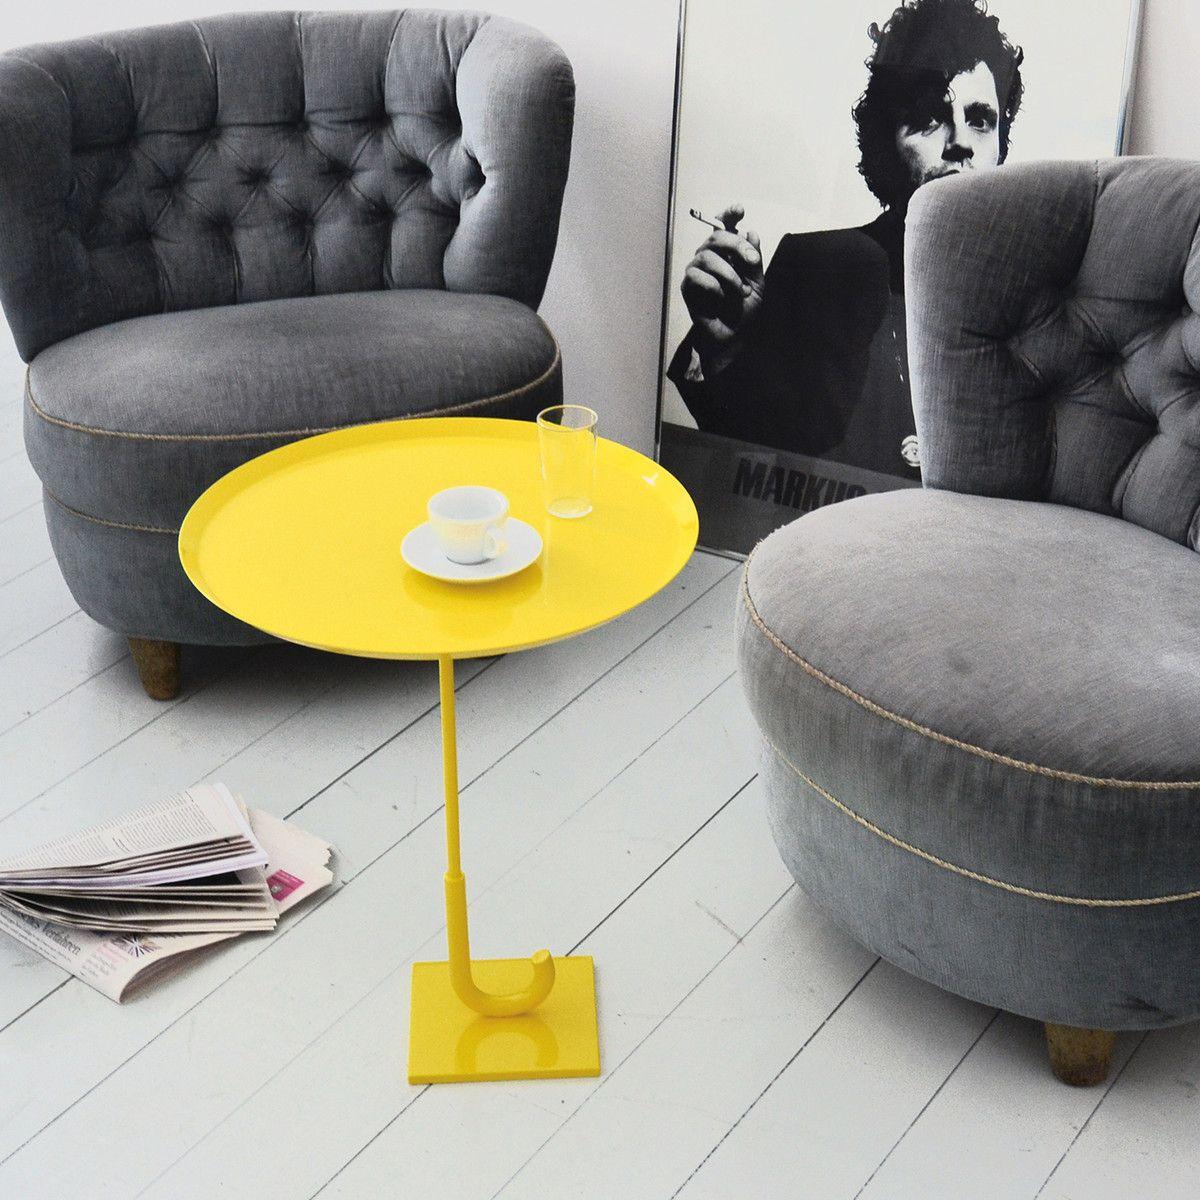 parapluie table yellow things i like pinterest sessel gelb und grau. Black Bedroom Furniture Sets. Home Design Ideas